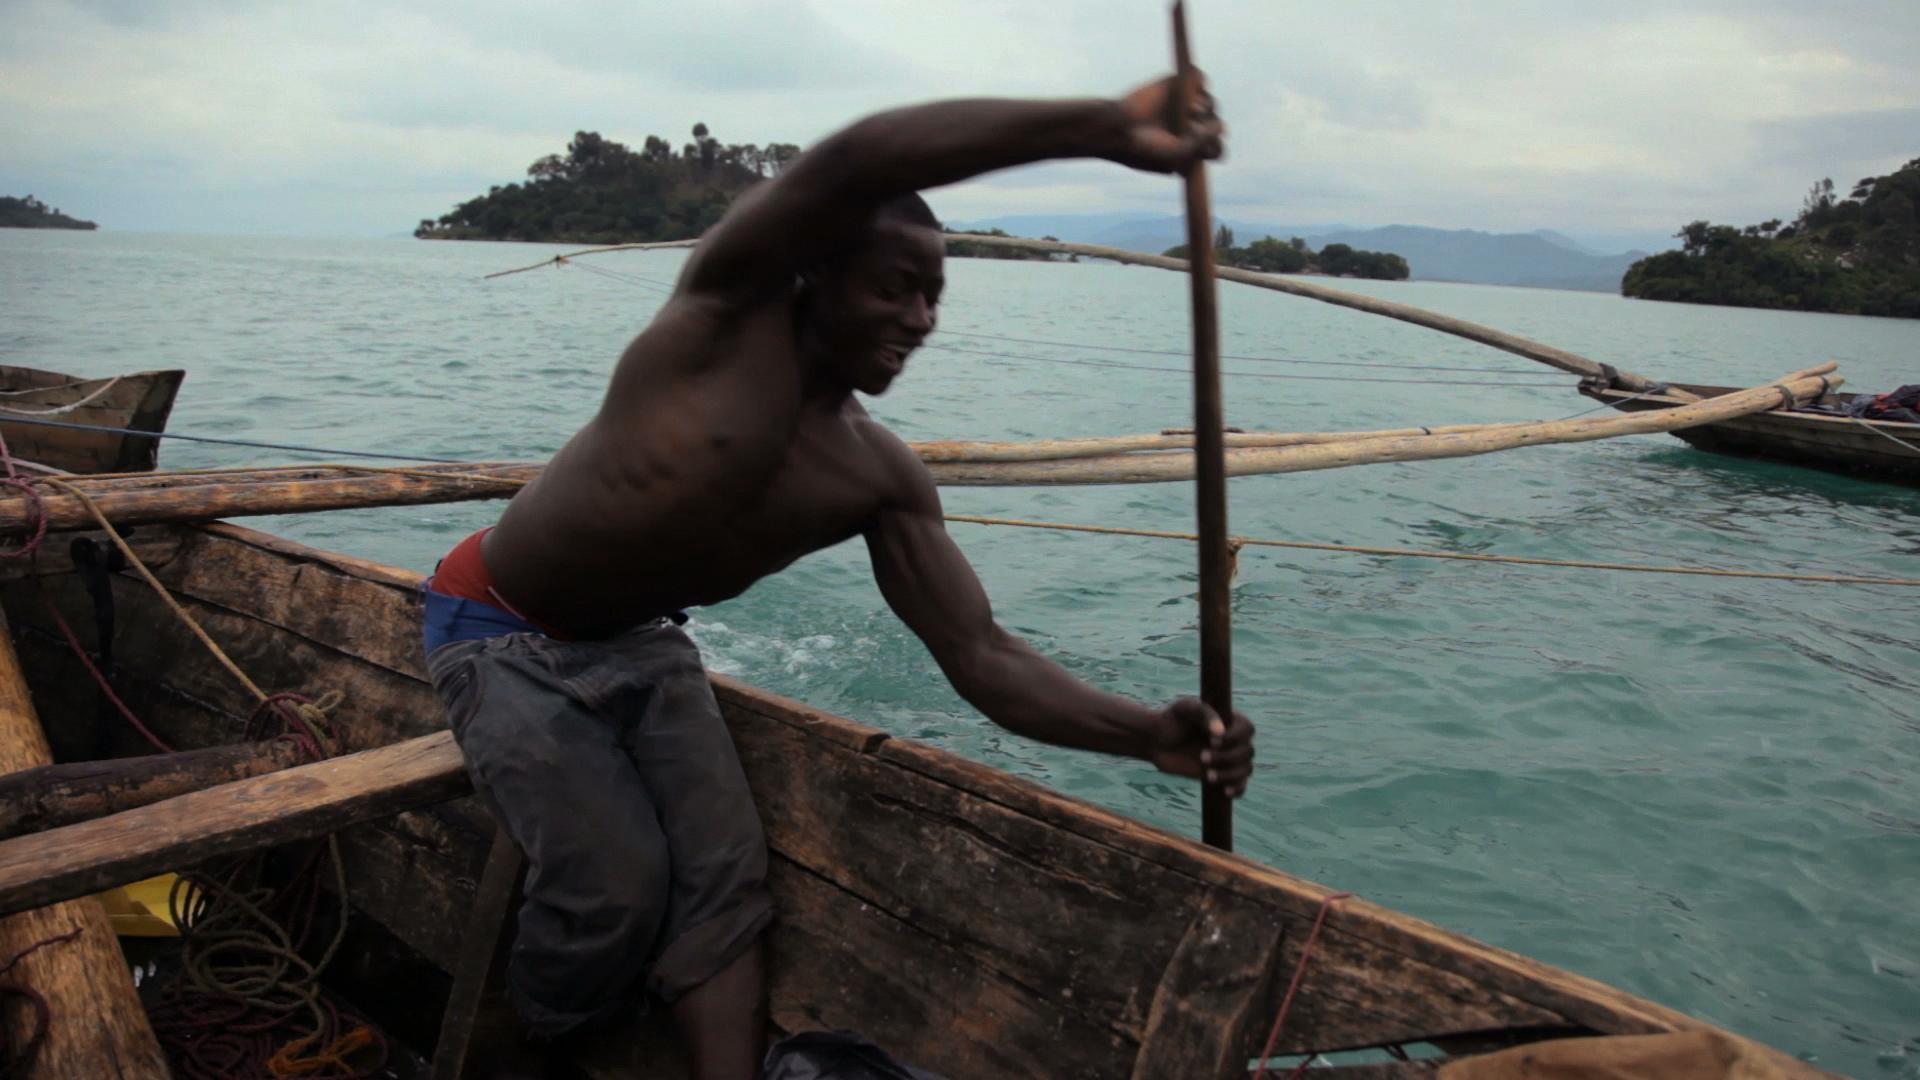 Sacred Water - Fisherman on the shores of the Kivu Lake, near Kibuye.